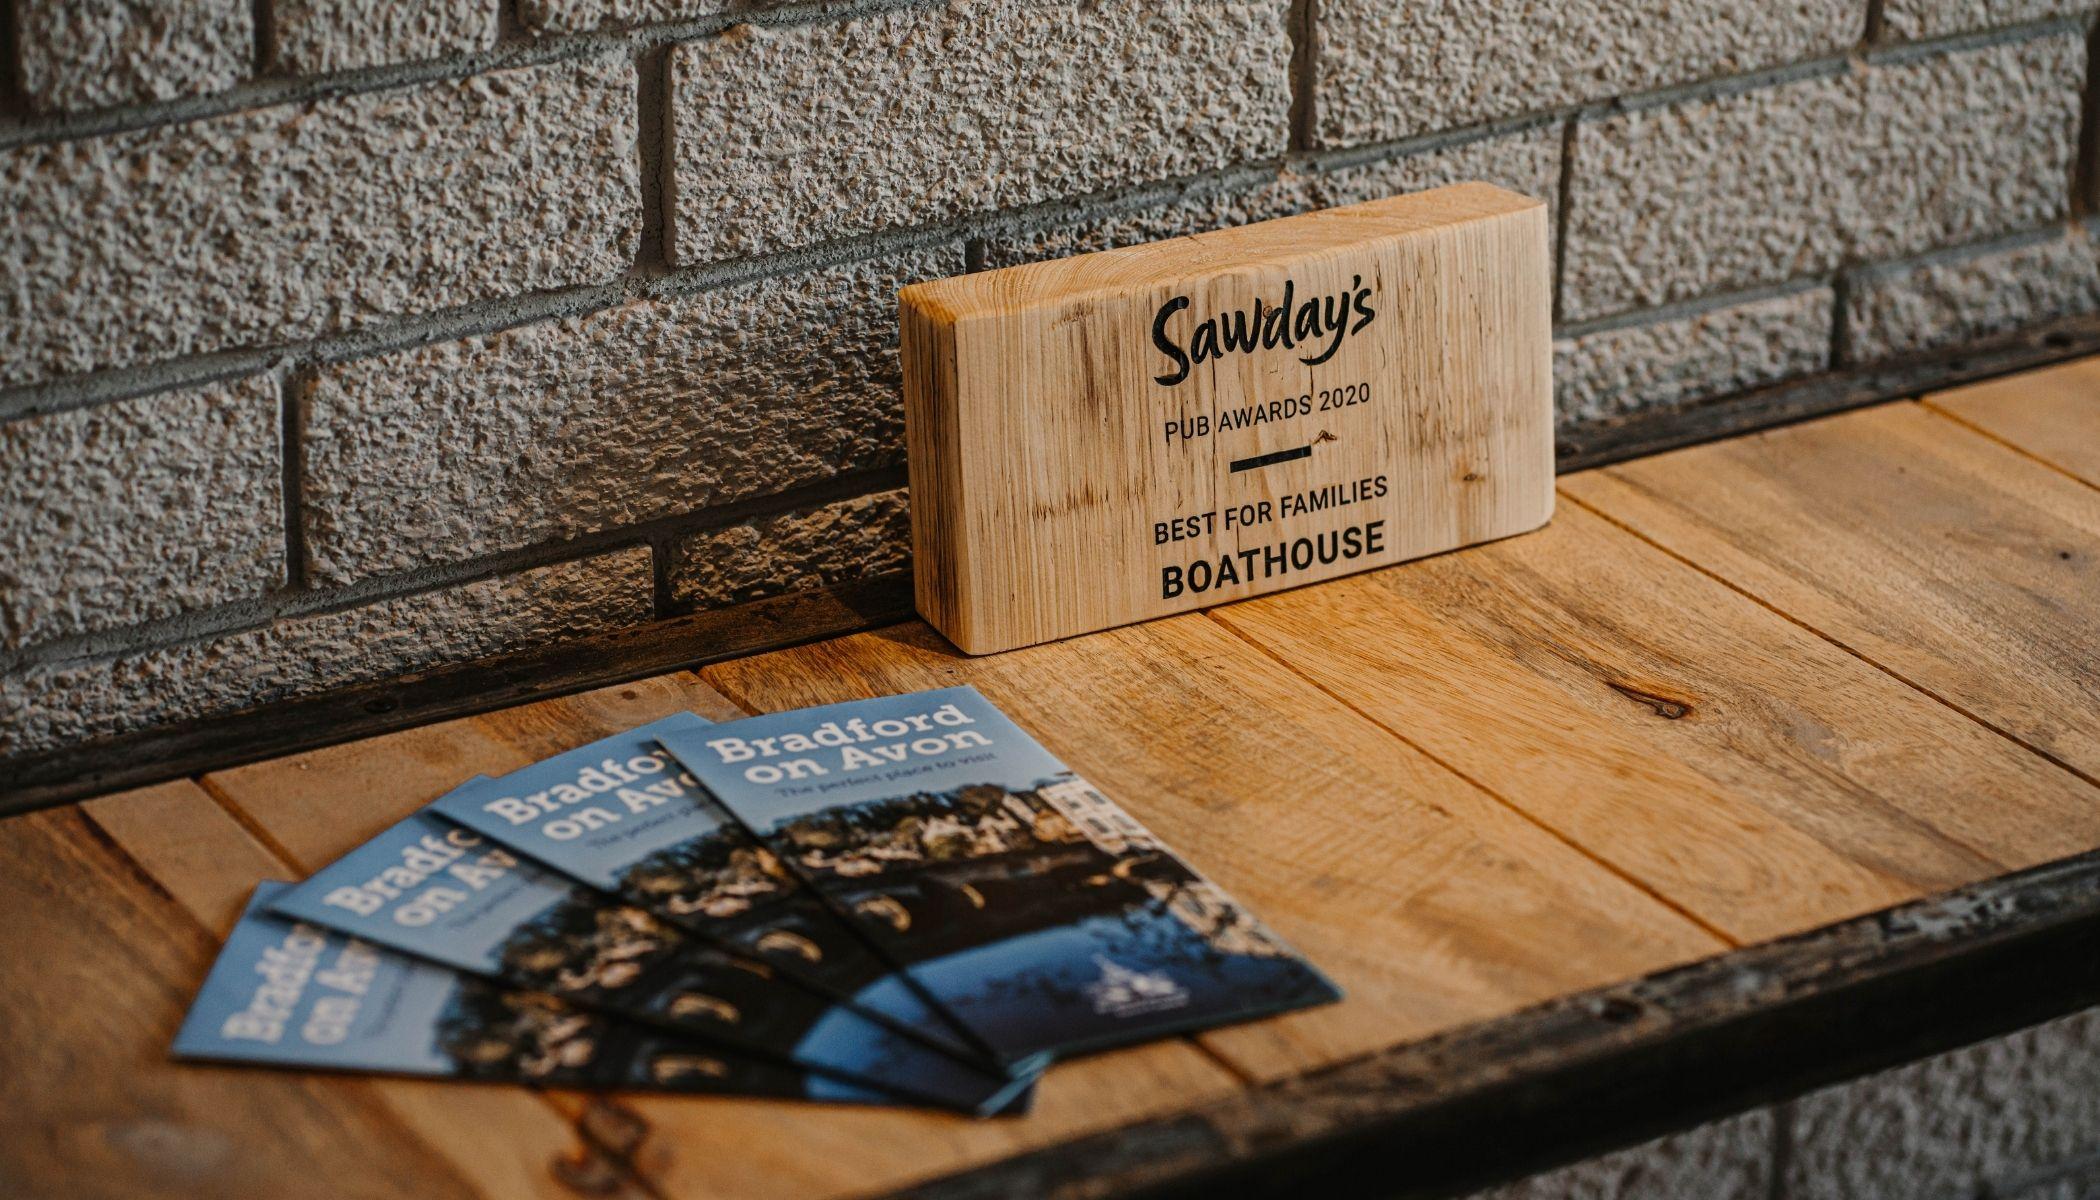 Sawdays Pub Awards 2020